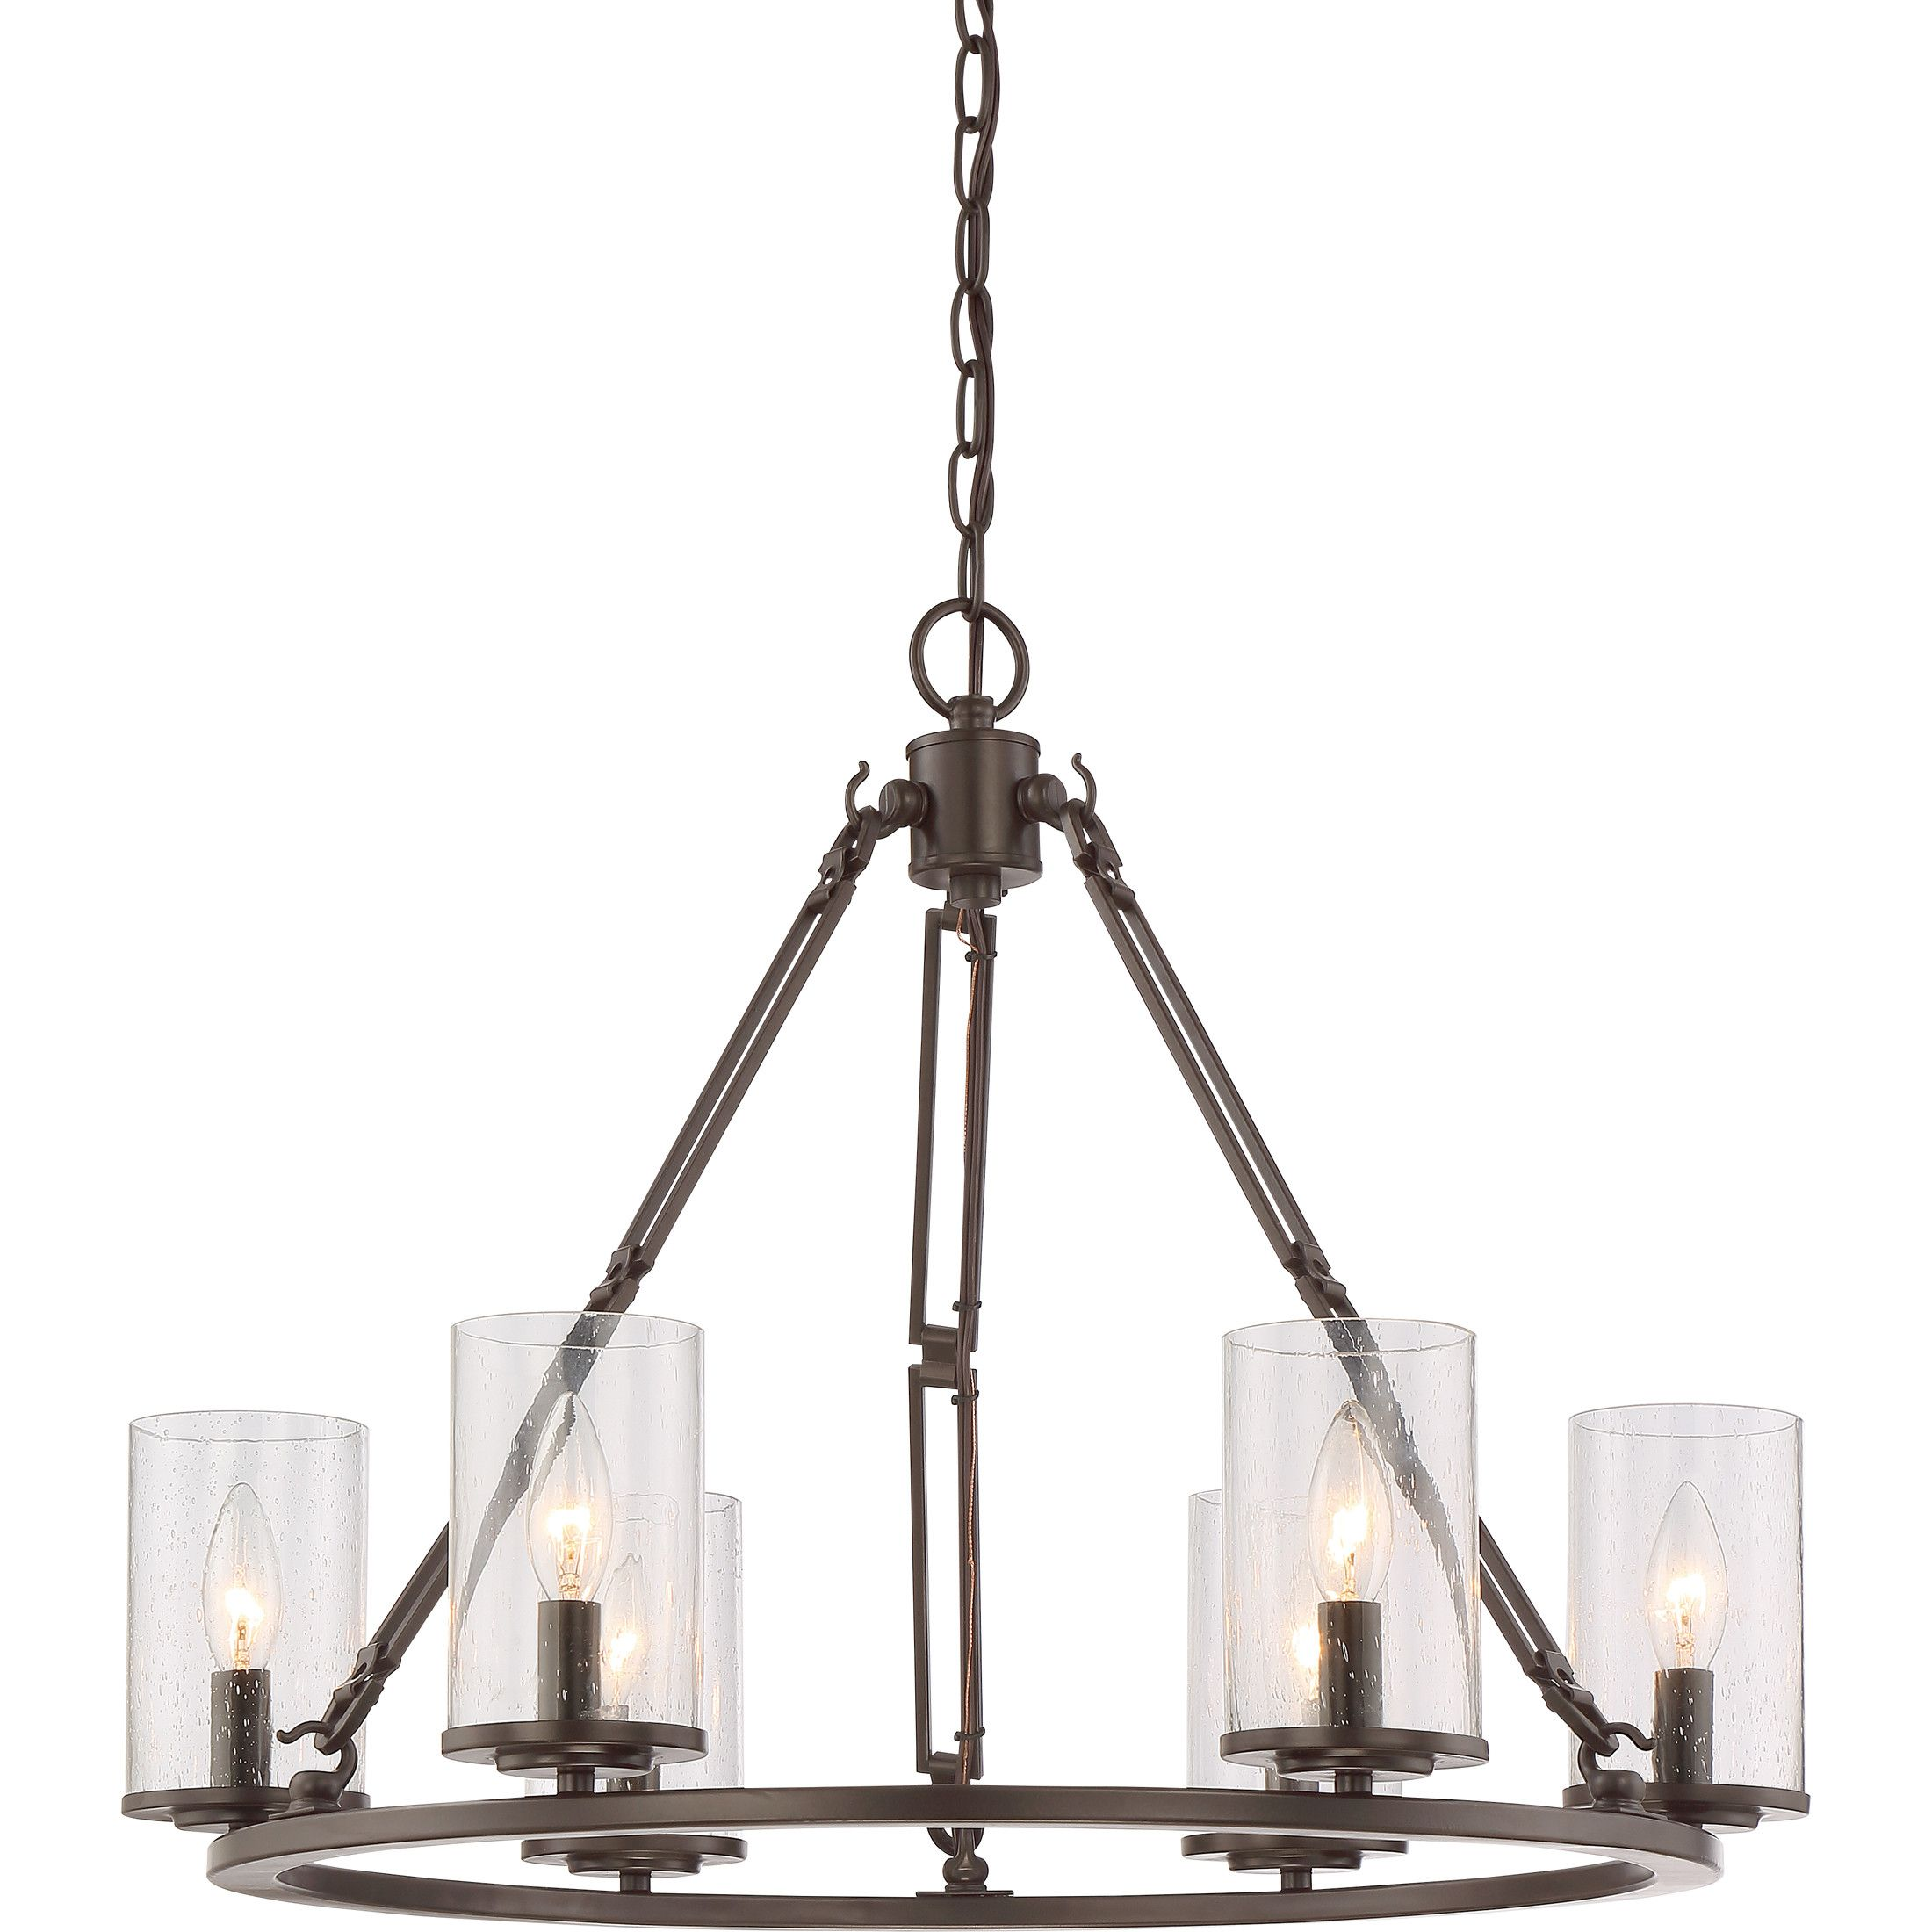 August Grove Brendan 6 Light Chandelier American Craftsmancraftsman Stylesimple